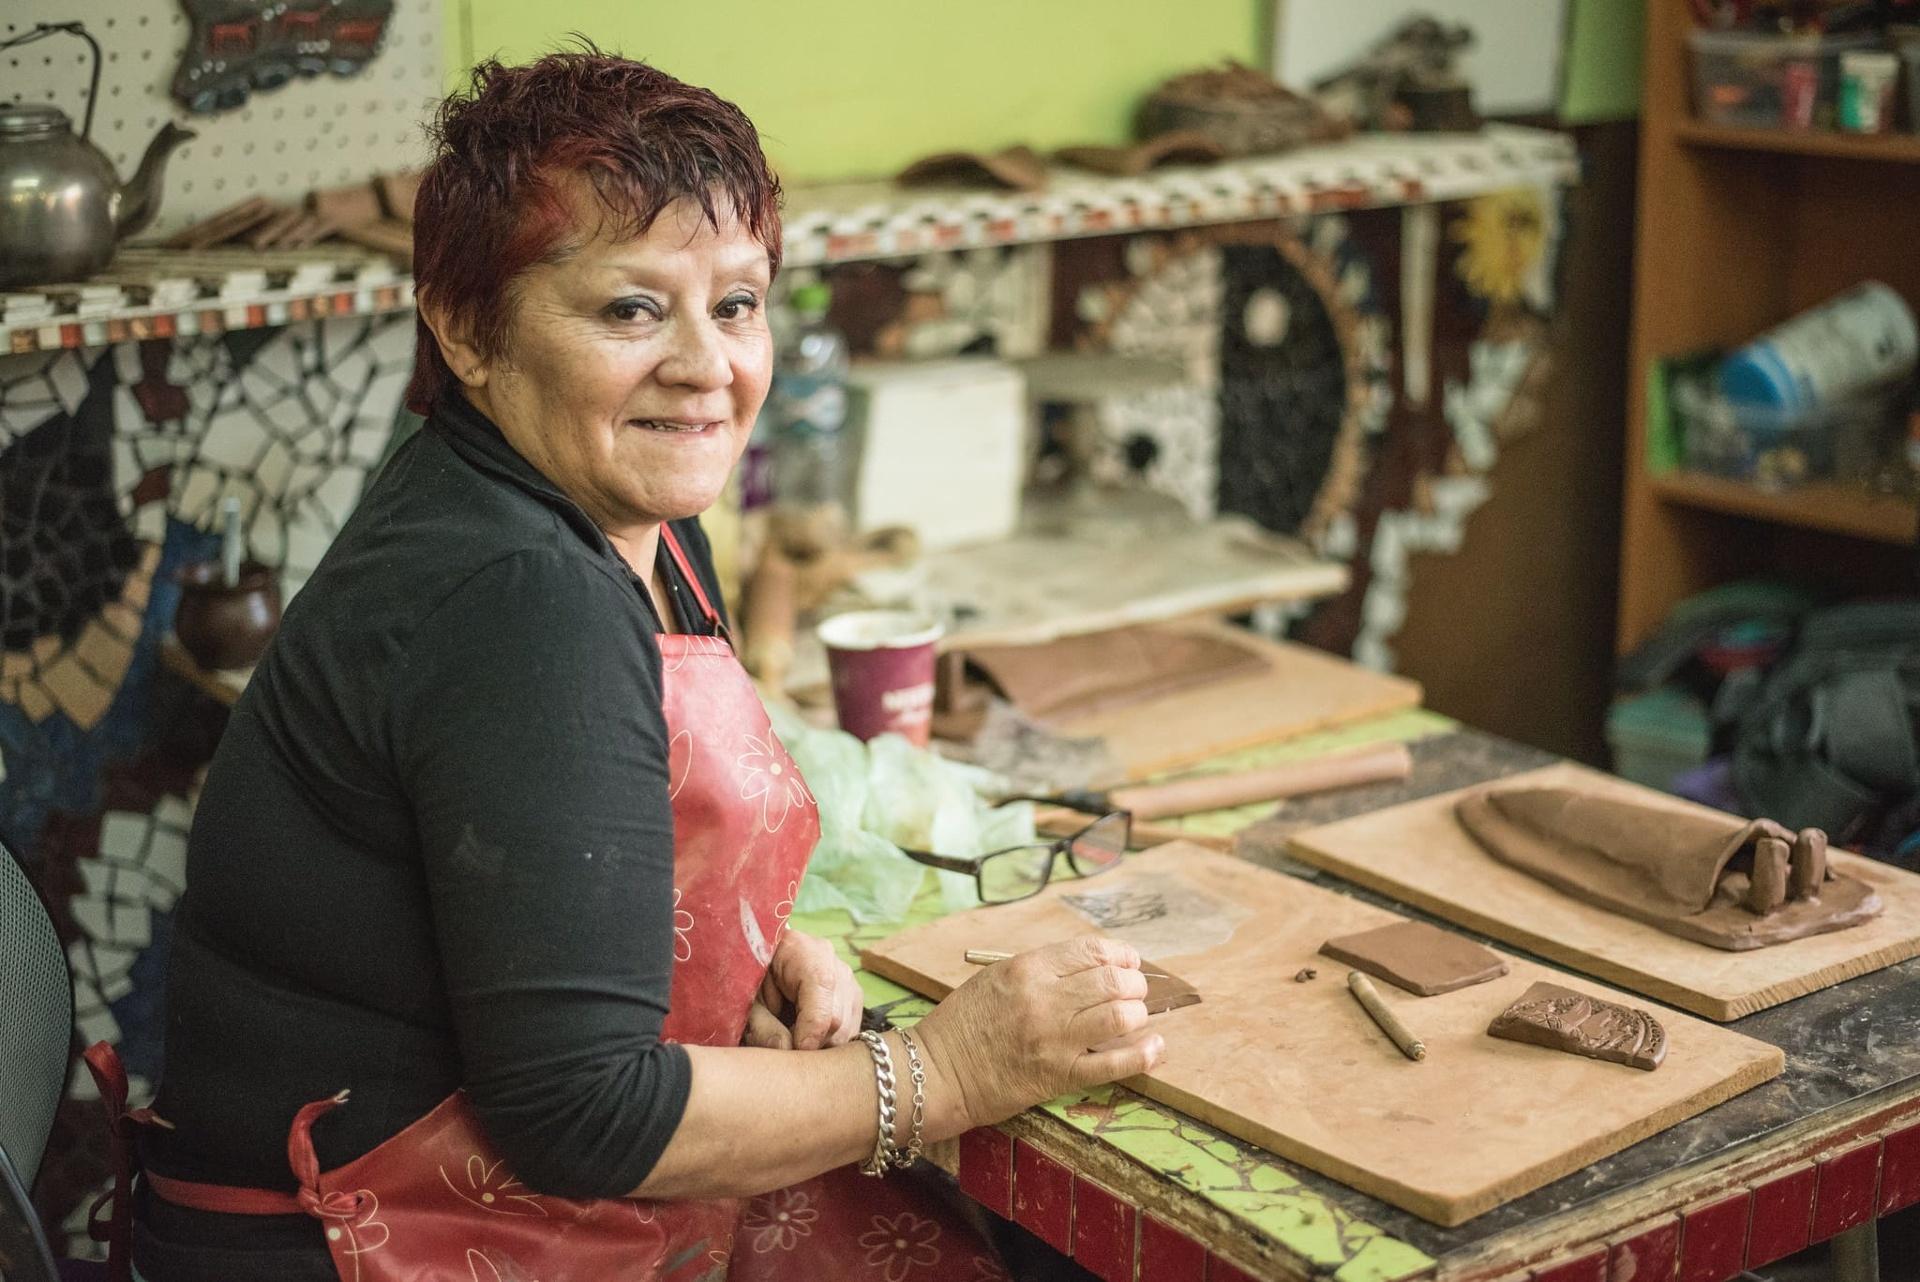 Puerto Natales artisans